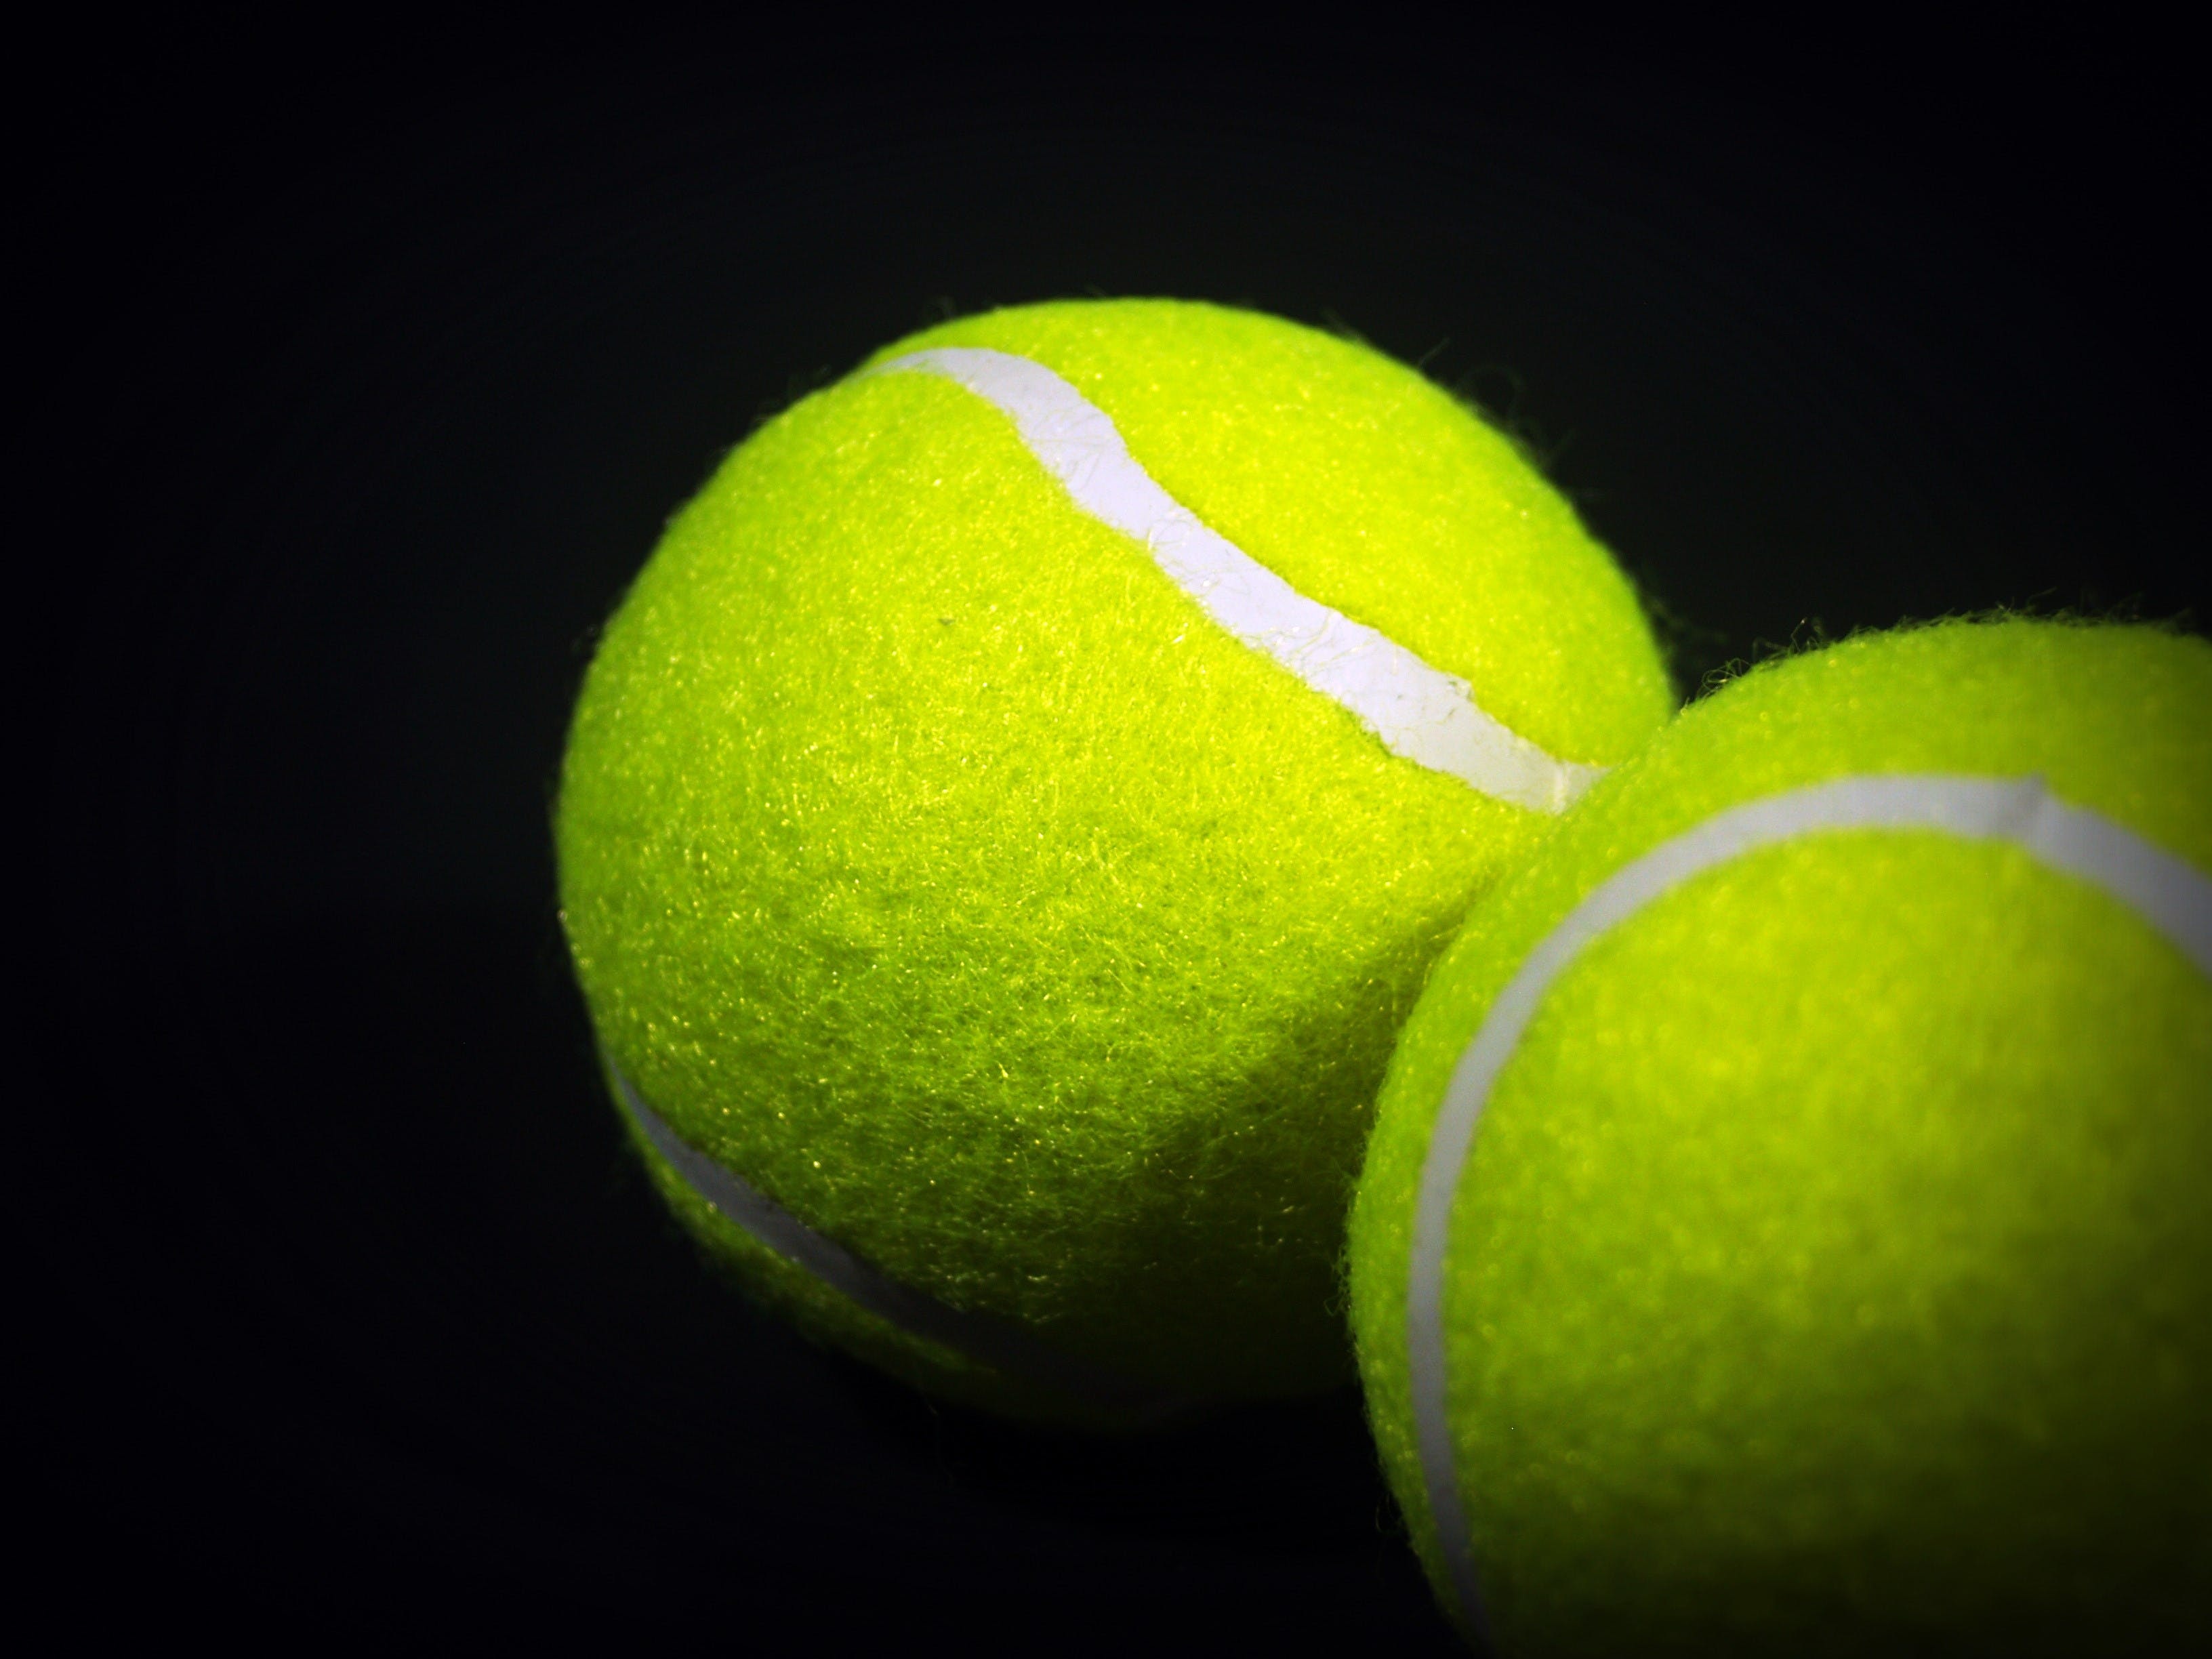 balls, close-up, tennis